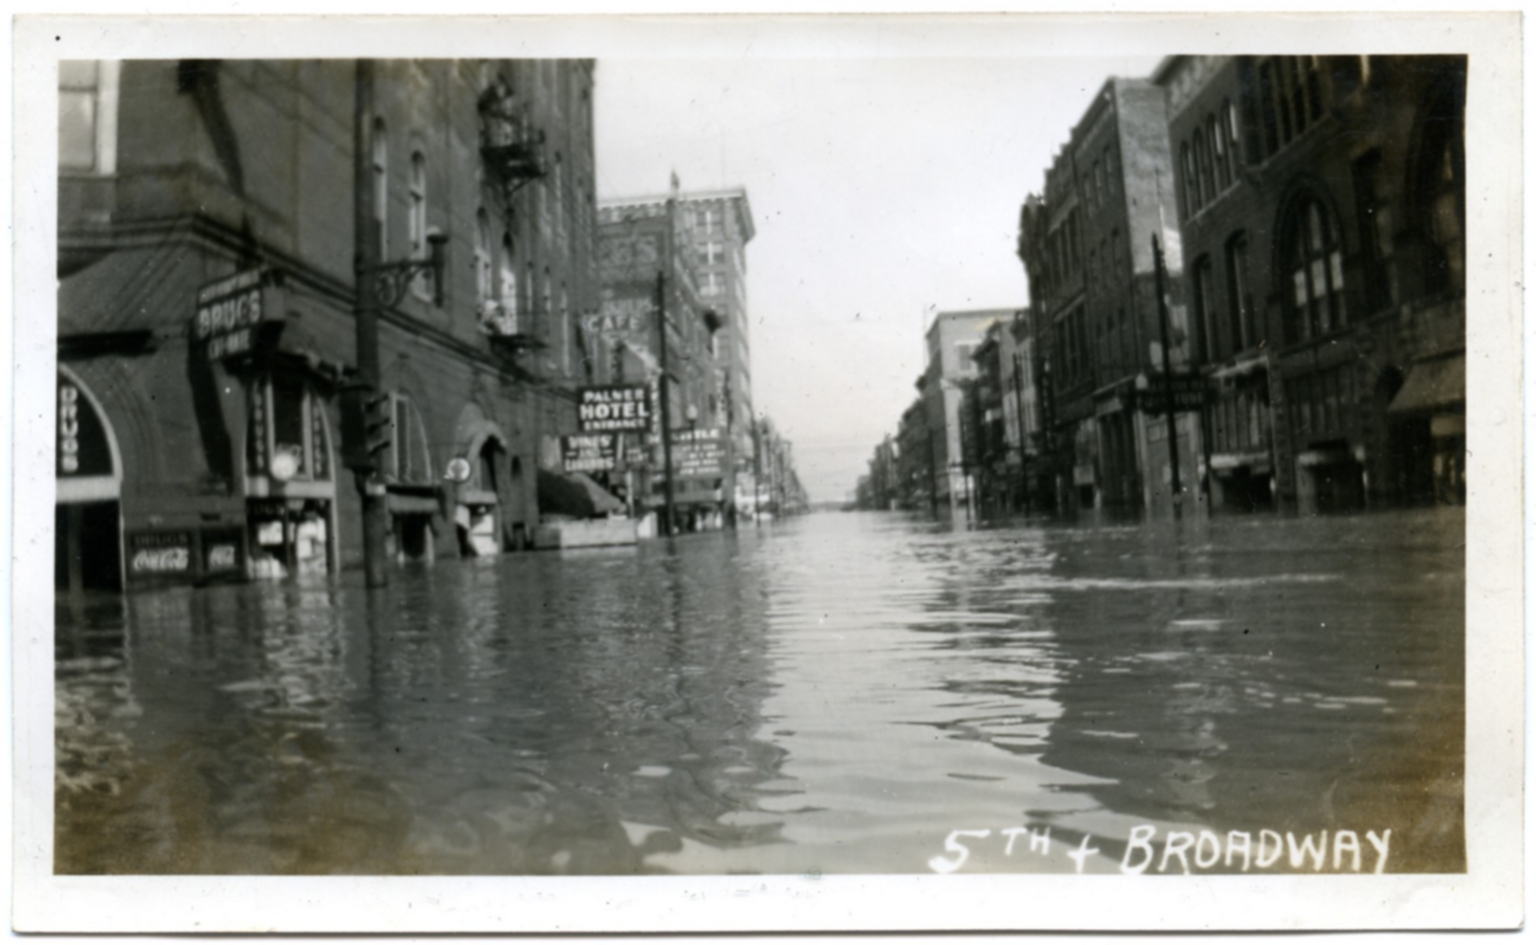 Broadway Street in downtown Paducah during '37 flood.